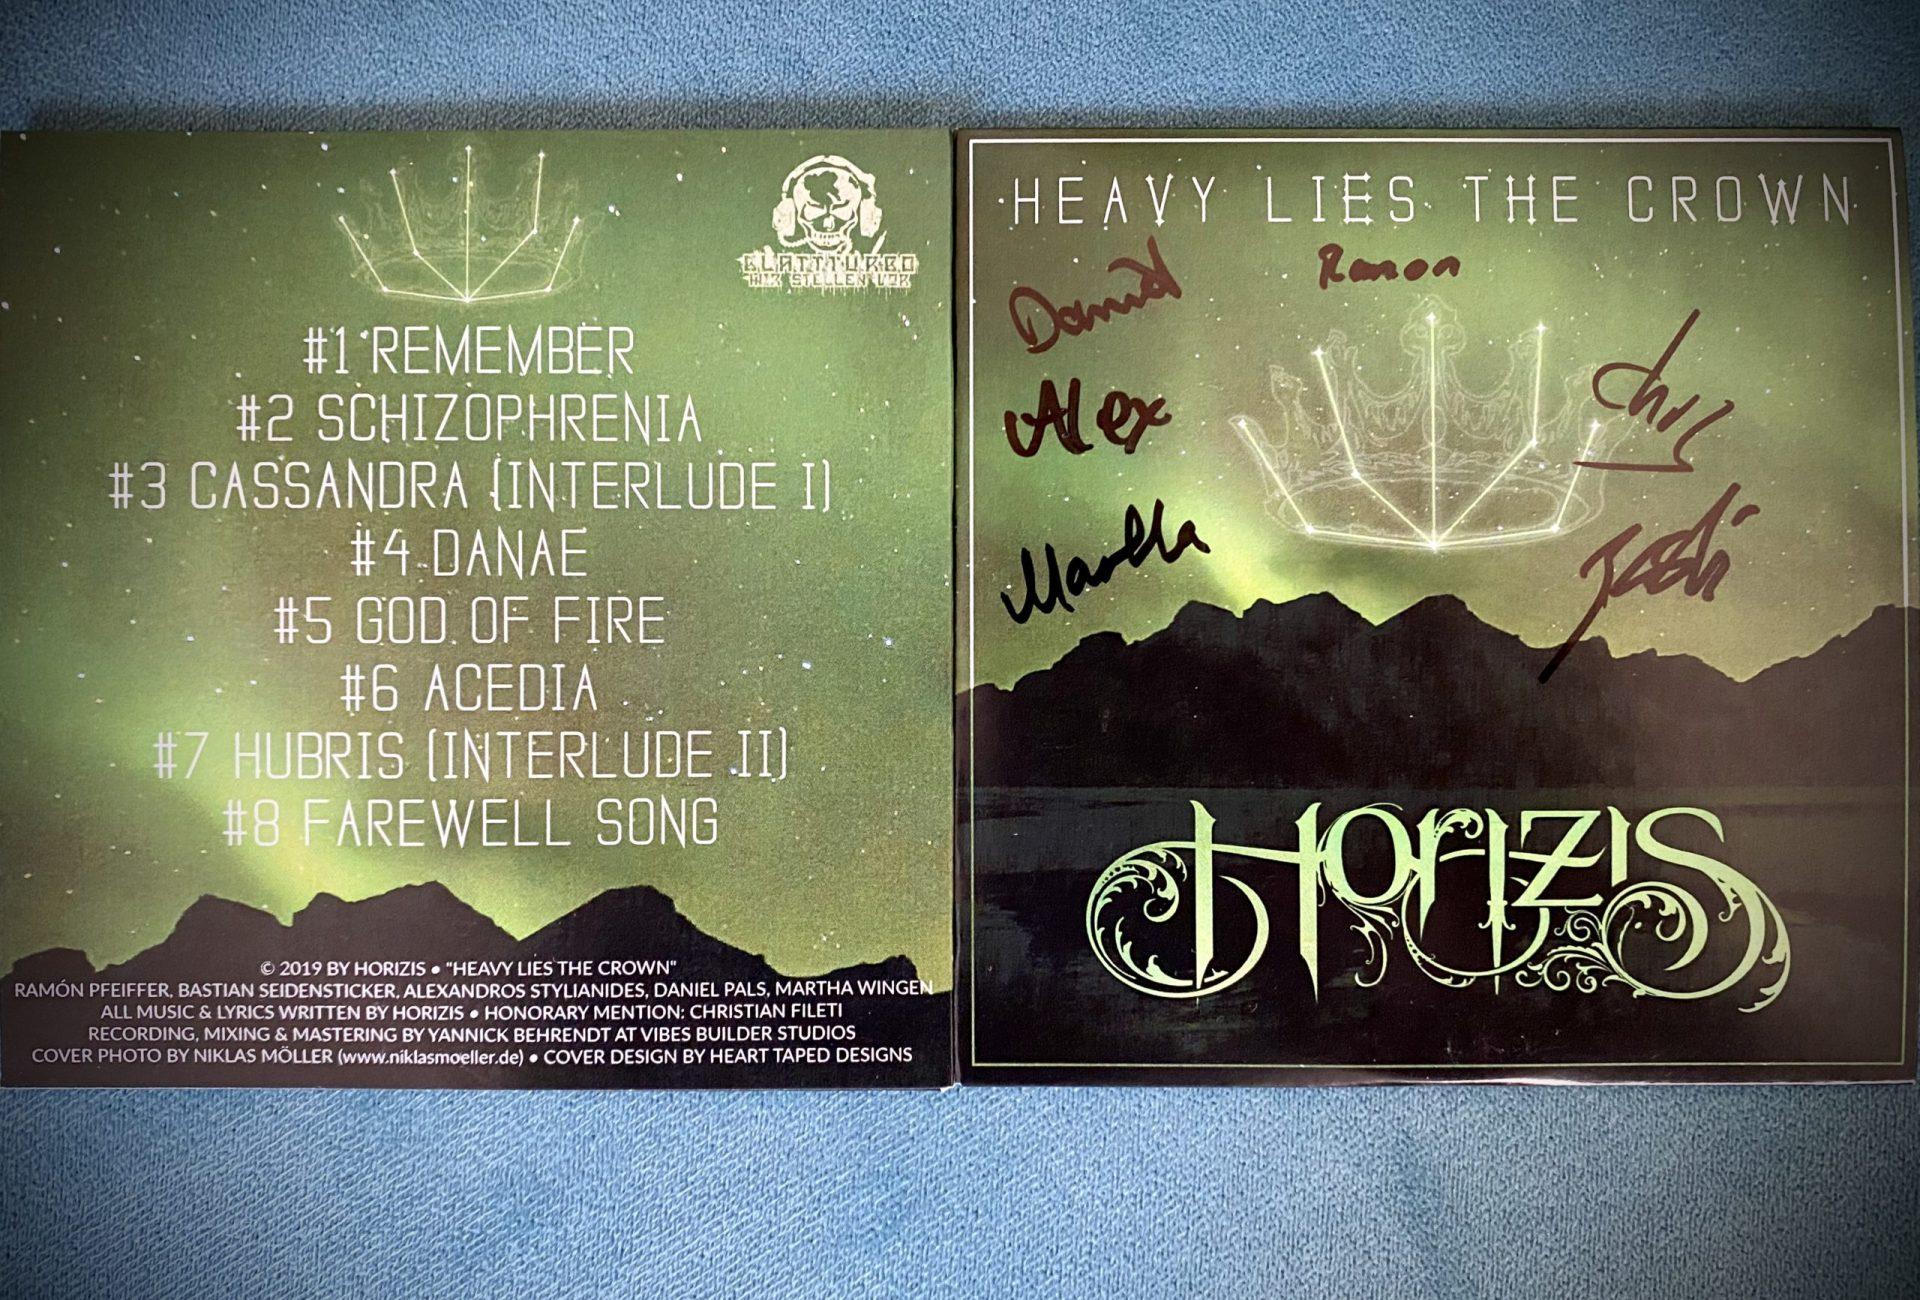 HLTC CD